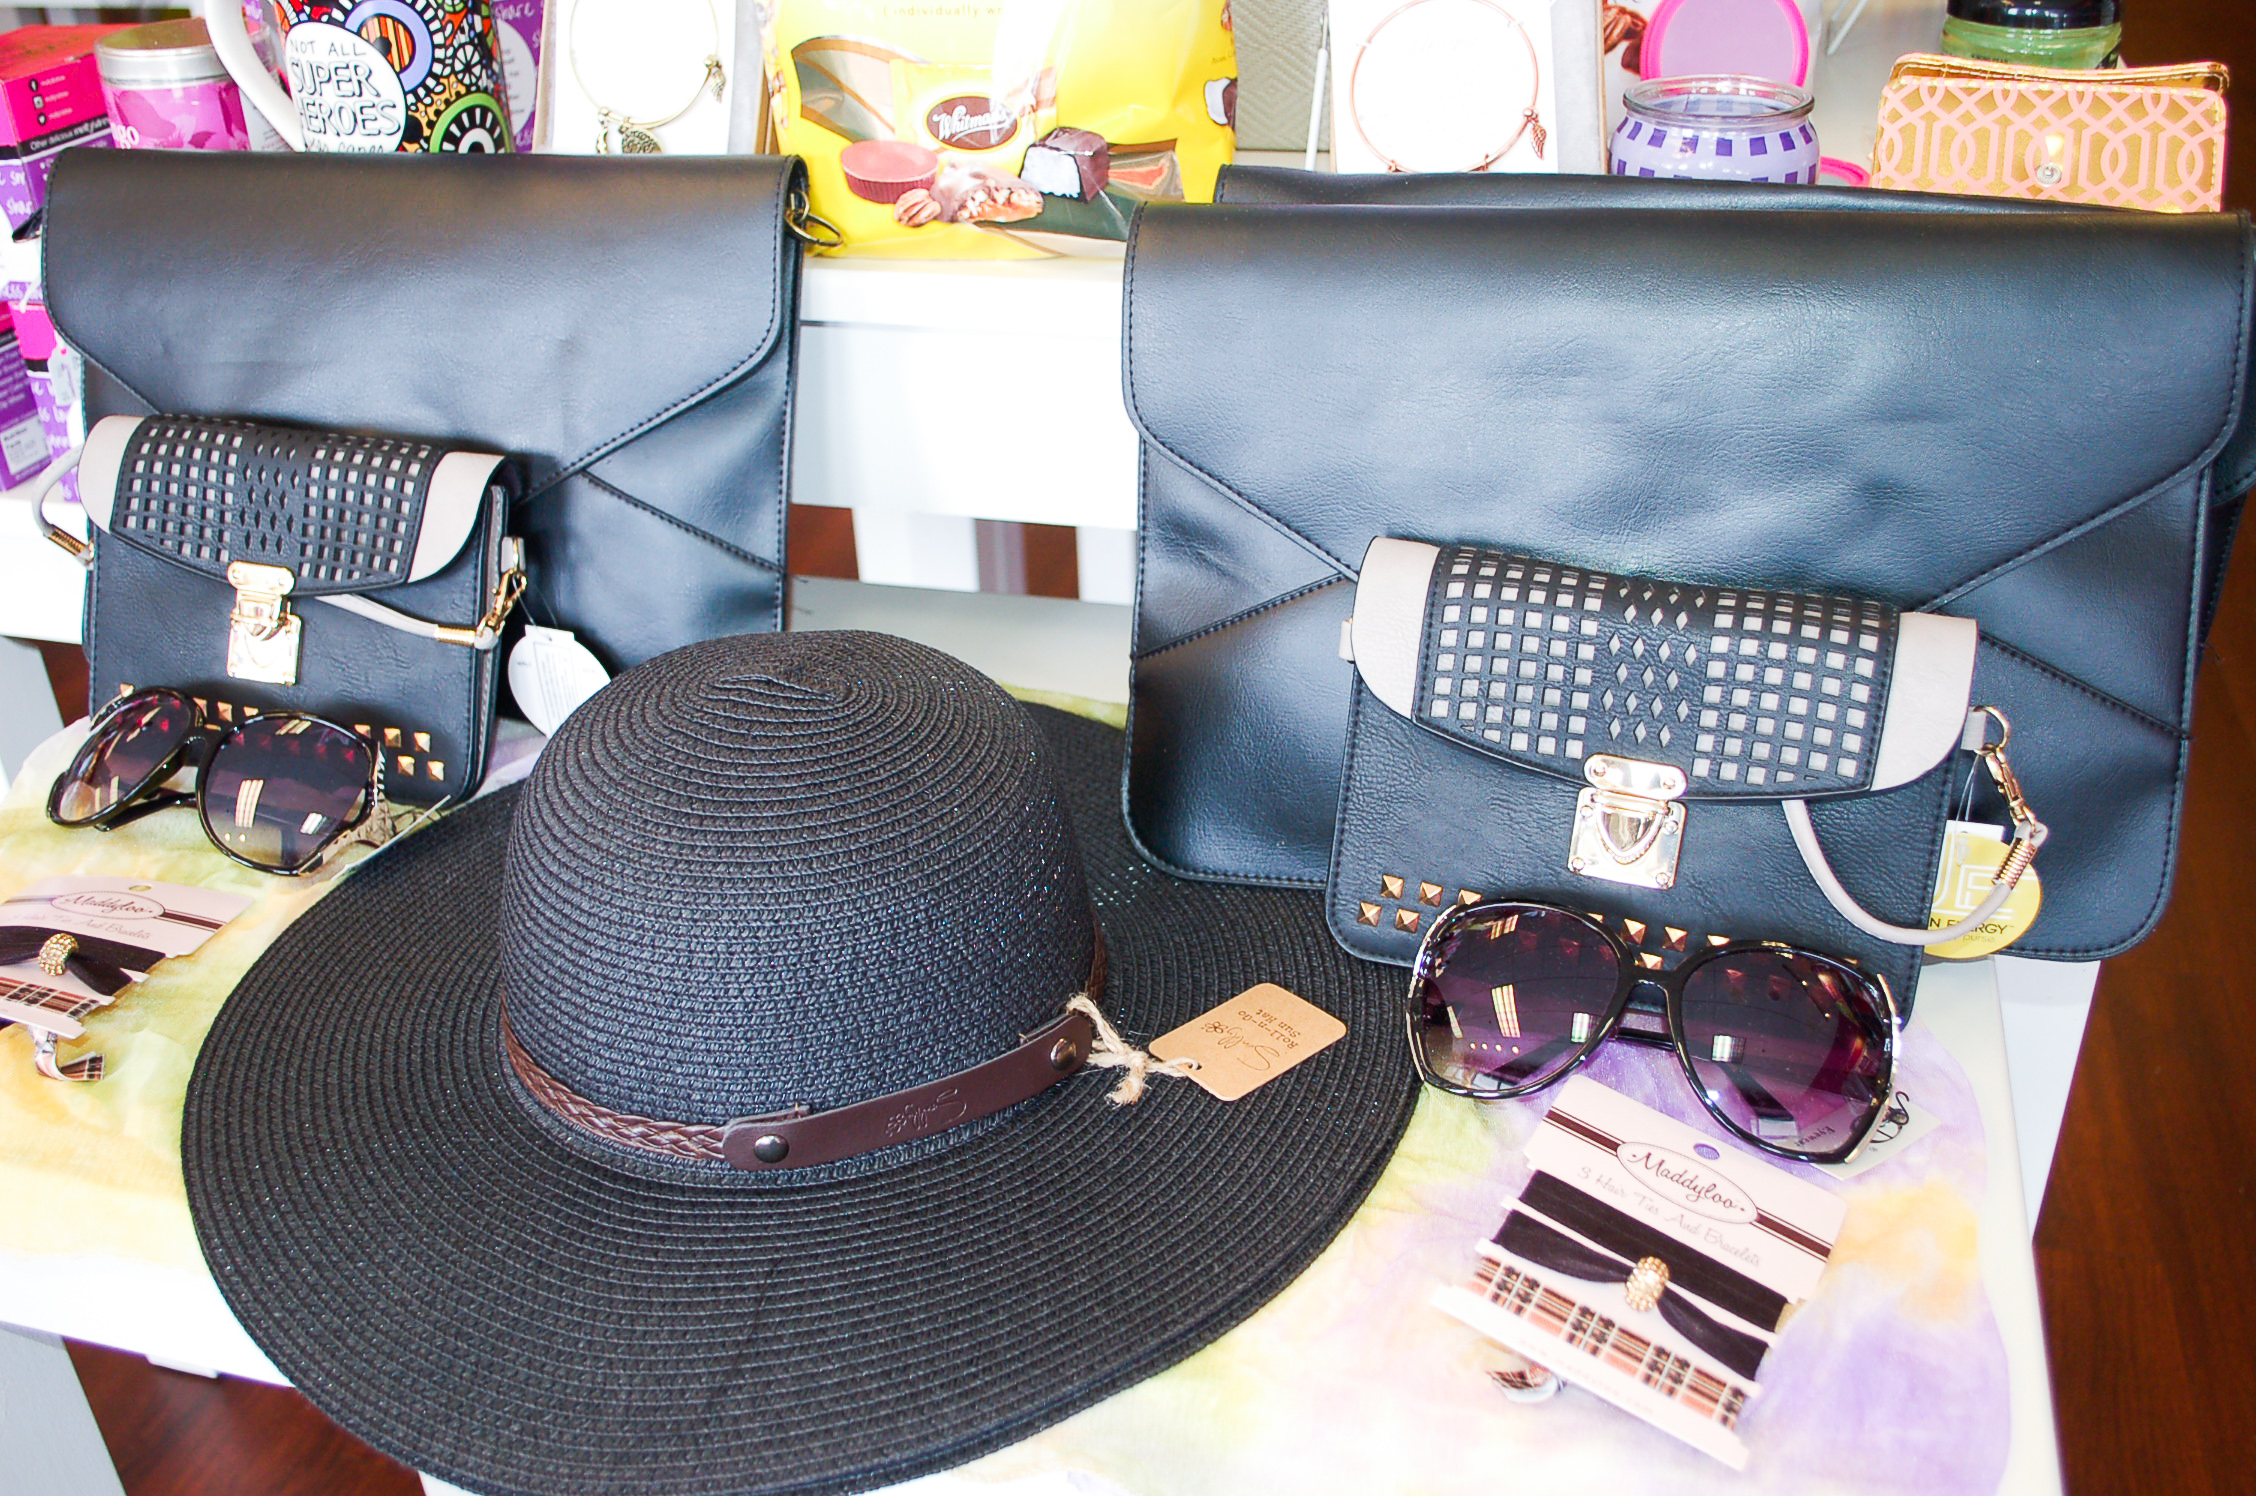 Fabulous Fashion - JewelryHandbagsScarvesApparelAccessories